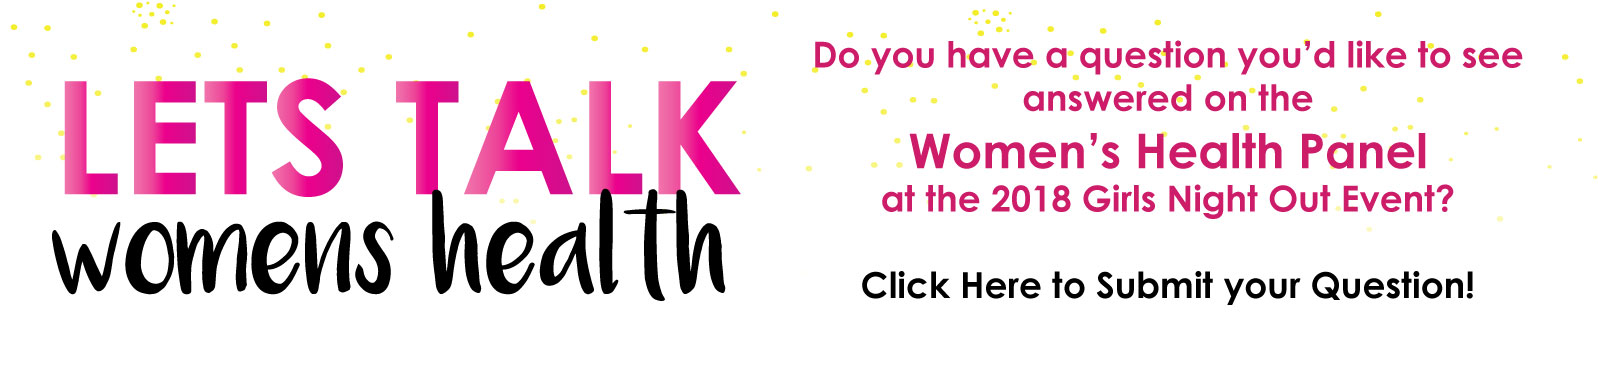 Women's Health Panel Questions